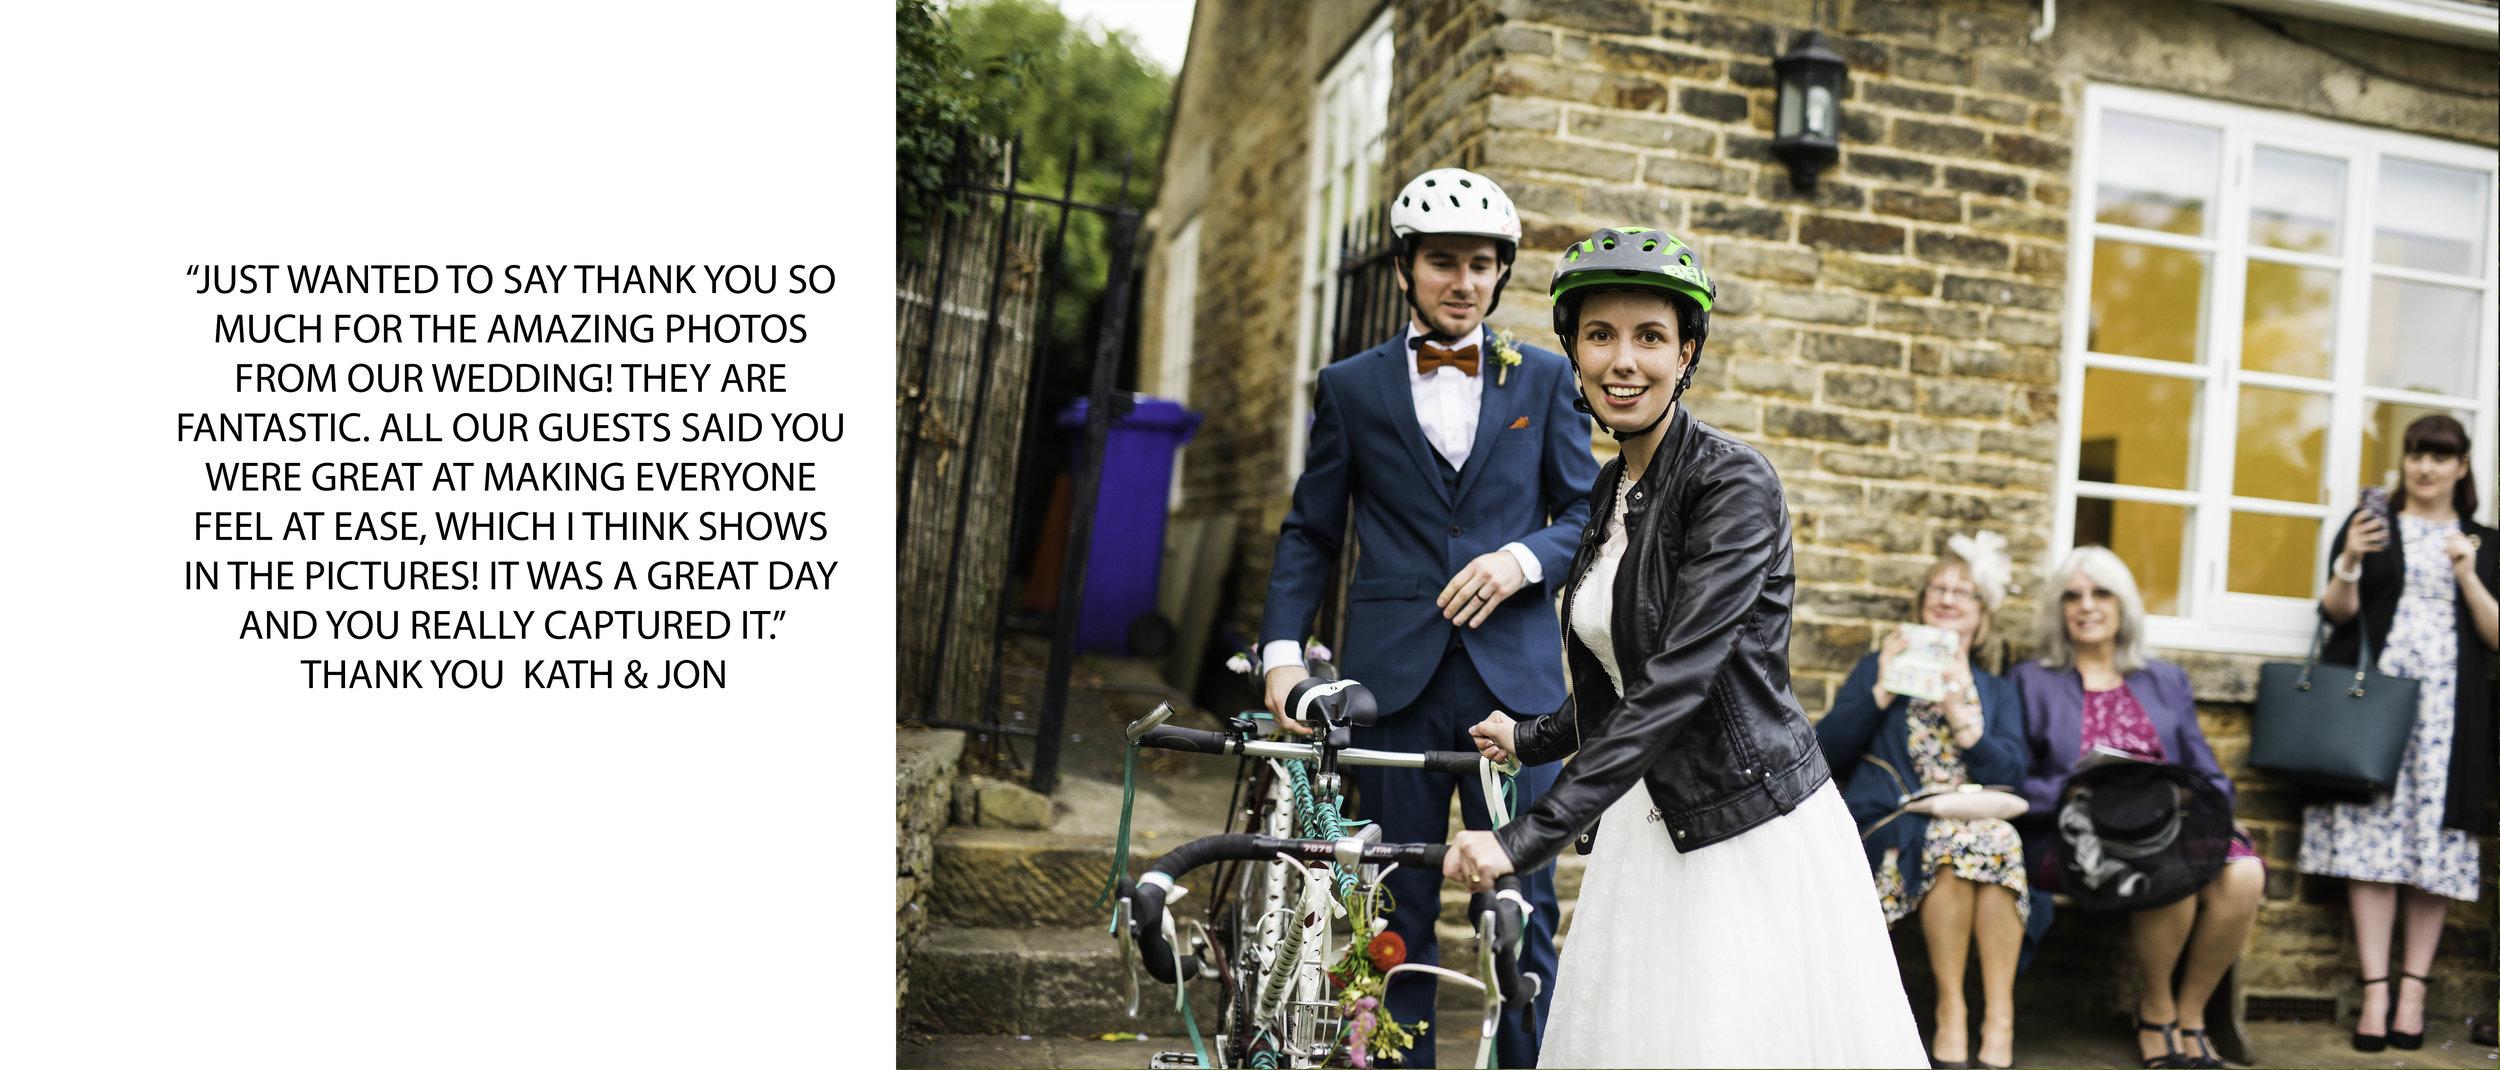 Nottingham wedding photographer review2.jpg